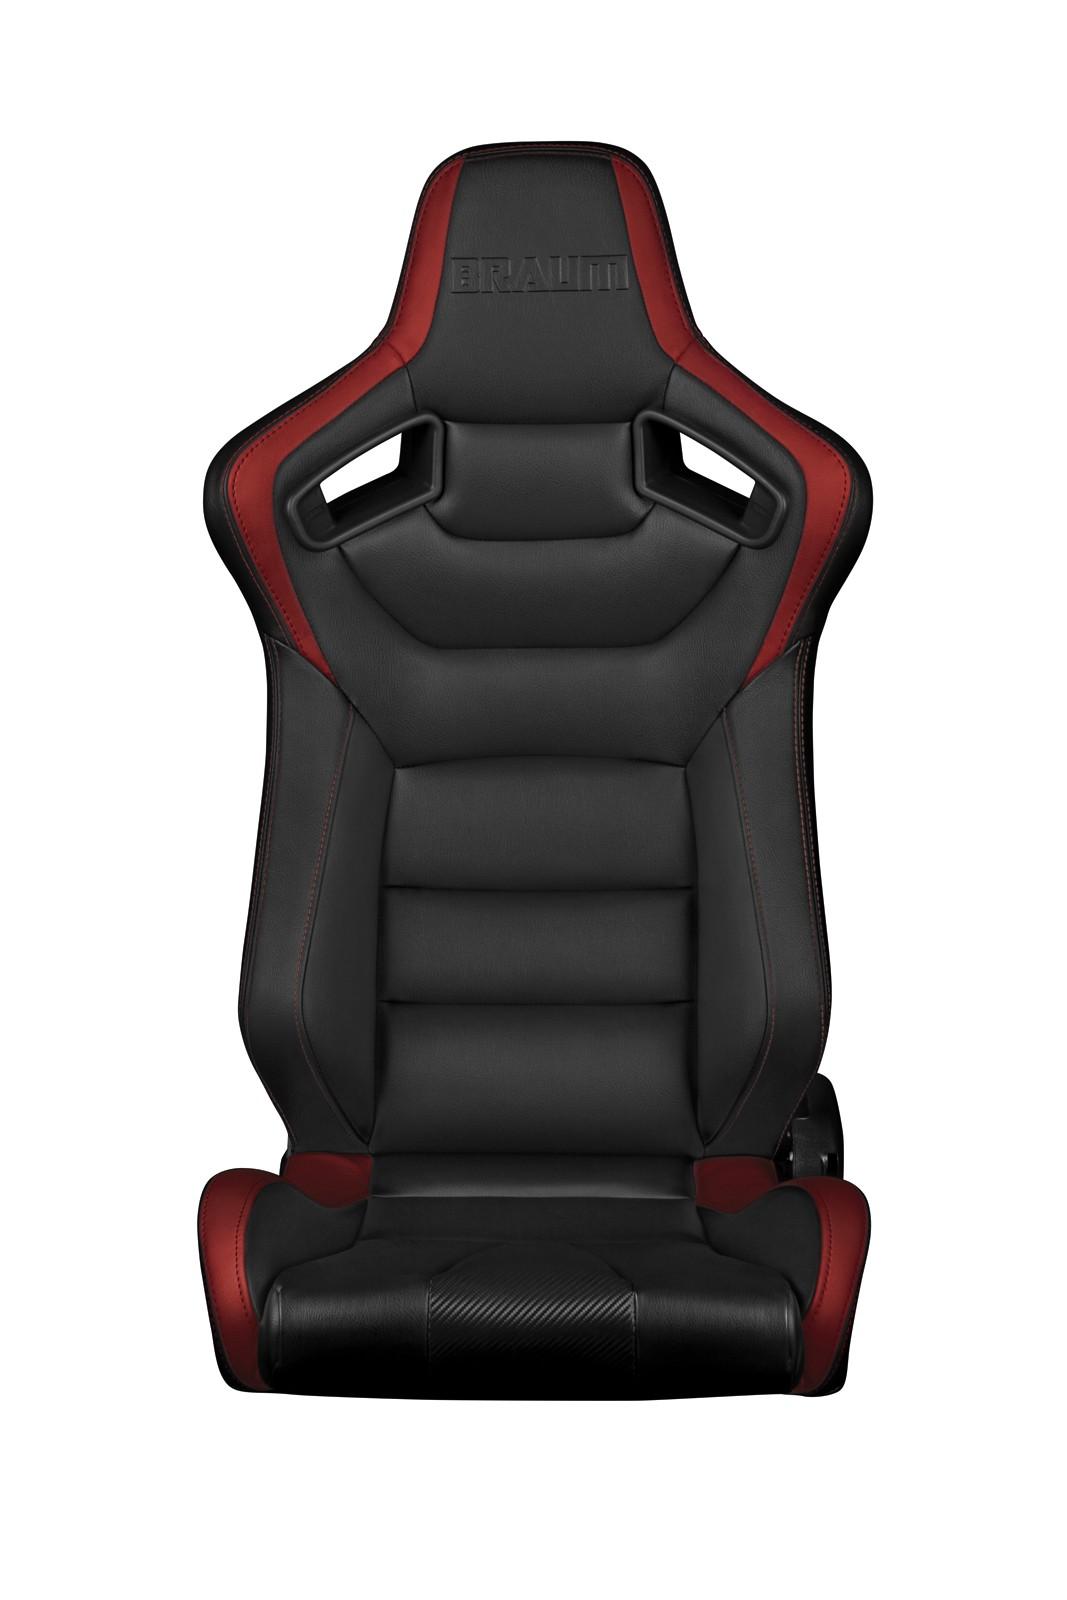 Braum Elite Series Racing Seats (Black & Red) - Universal